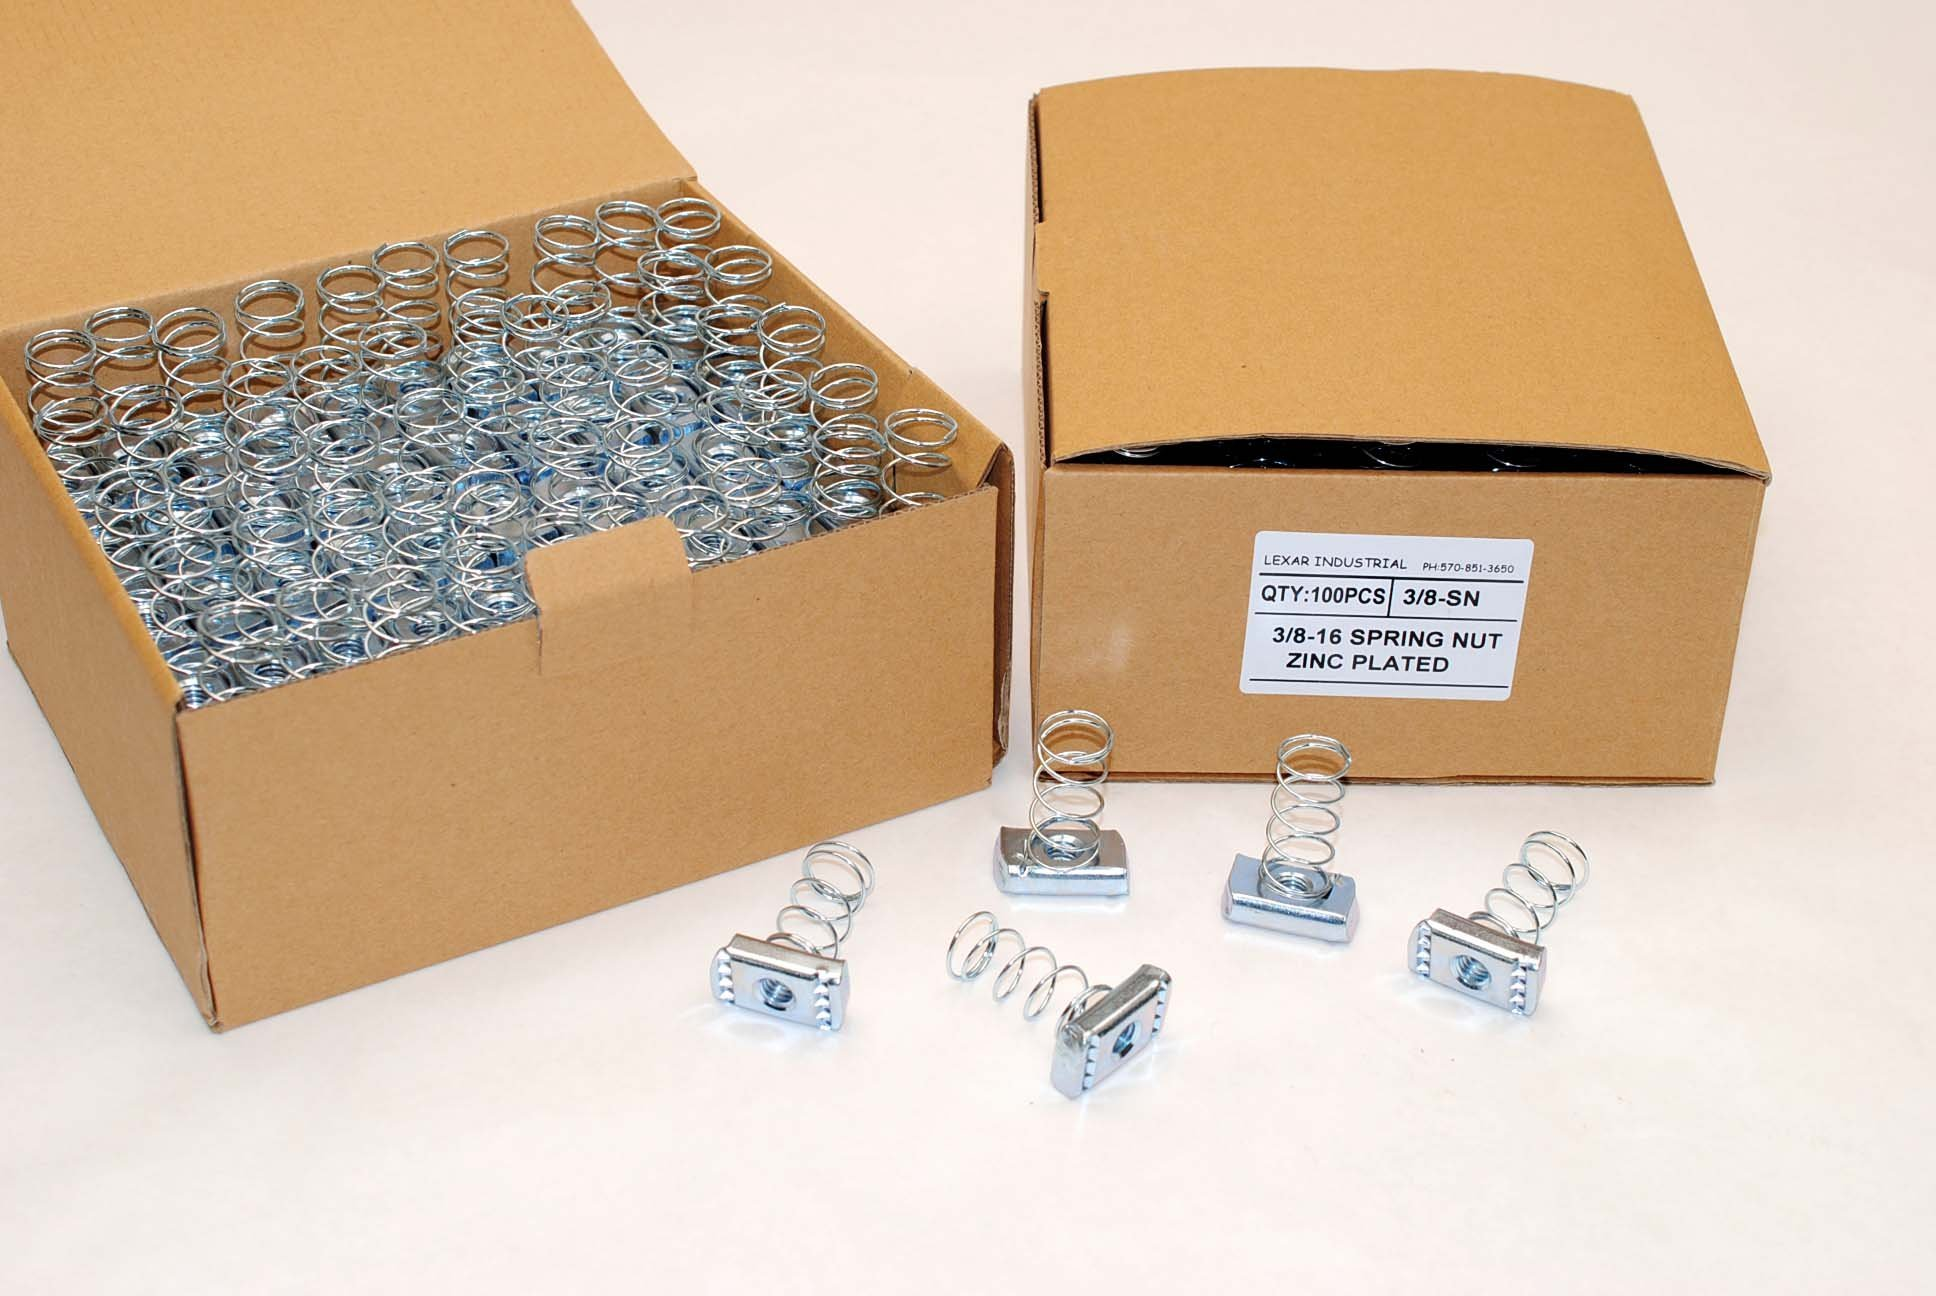 (100) Strut Channel Nuts 3/8-16 Standard Spring Zinc Plated Unistrut Nut by Lexar Industrial